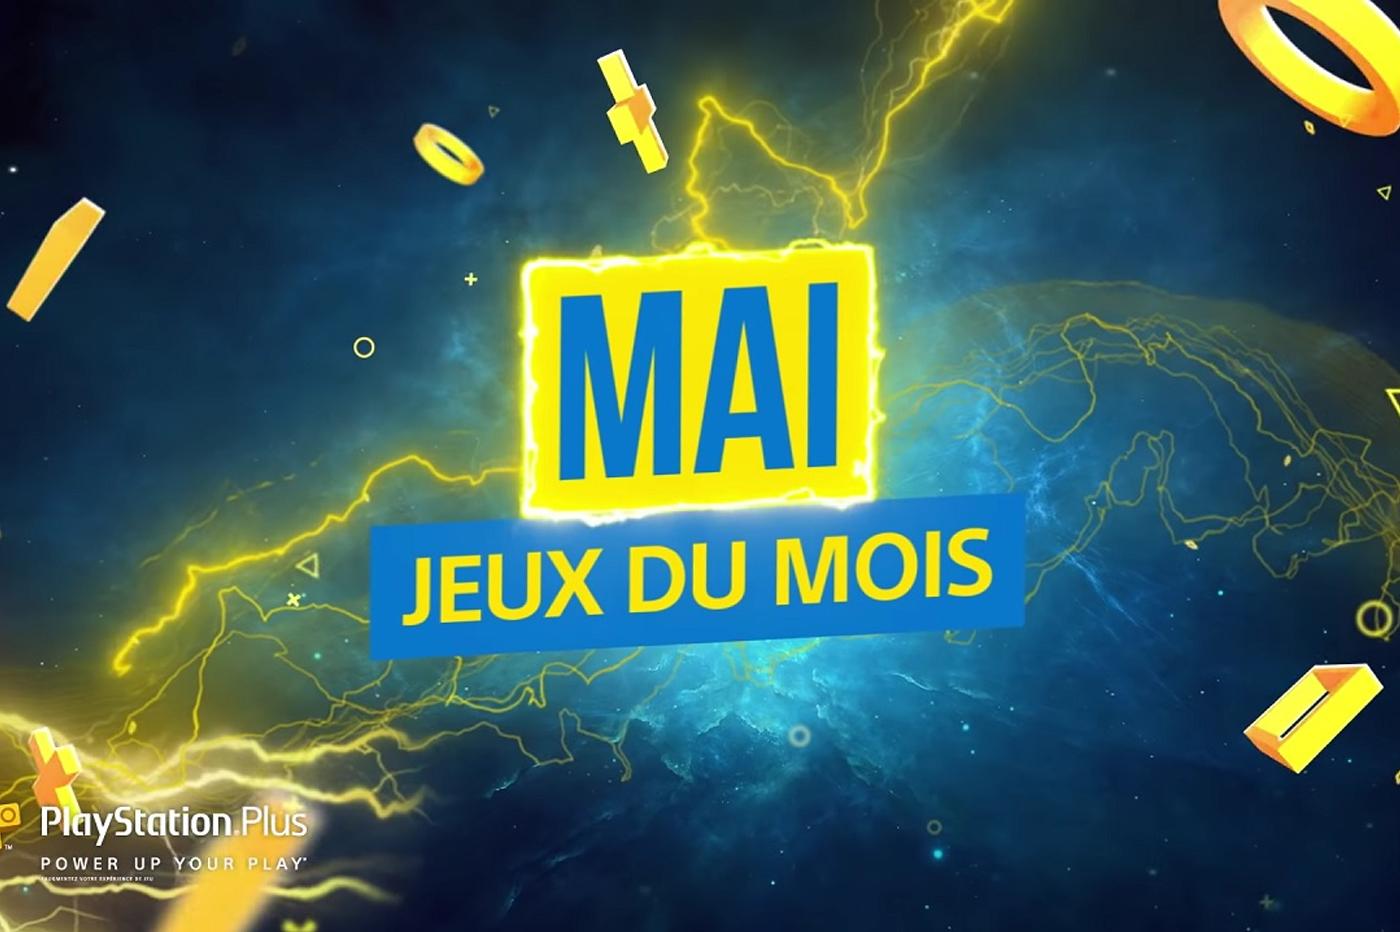 https://www.presse-citron.net/wordpress_prod/wp-content/uploads/2019/05/jeux-ps4-offerts-ps-plus-mai-2019.jpg